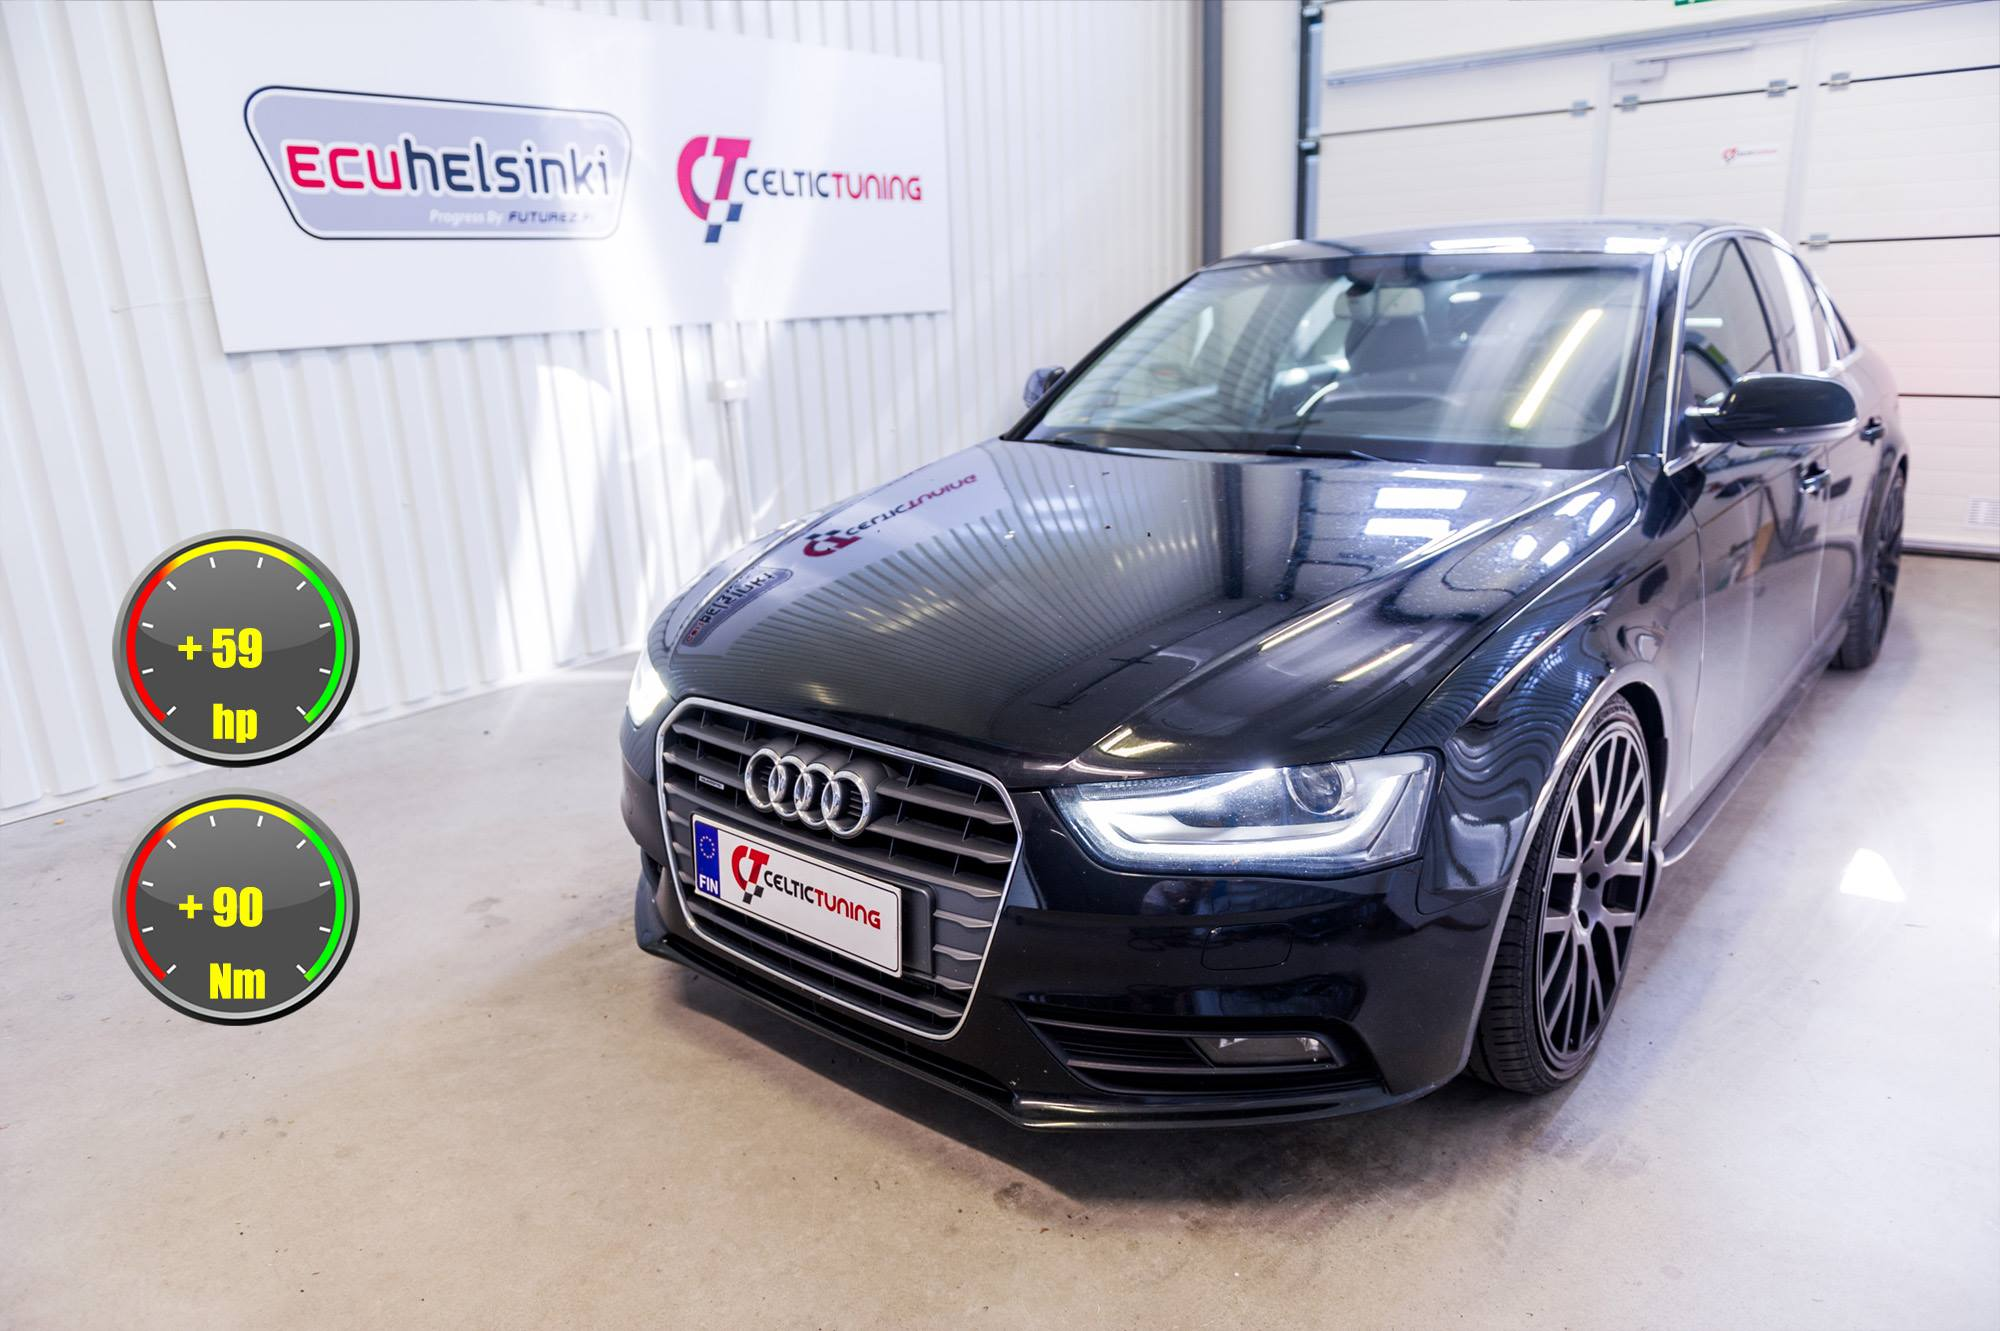 Audi A4 3.0 TDI lastutus celtic